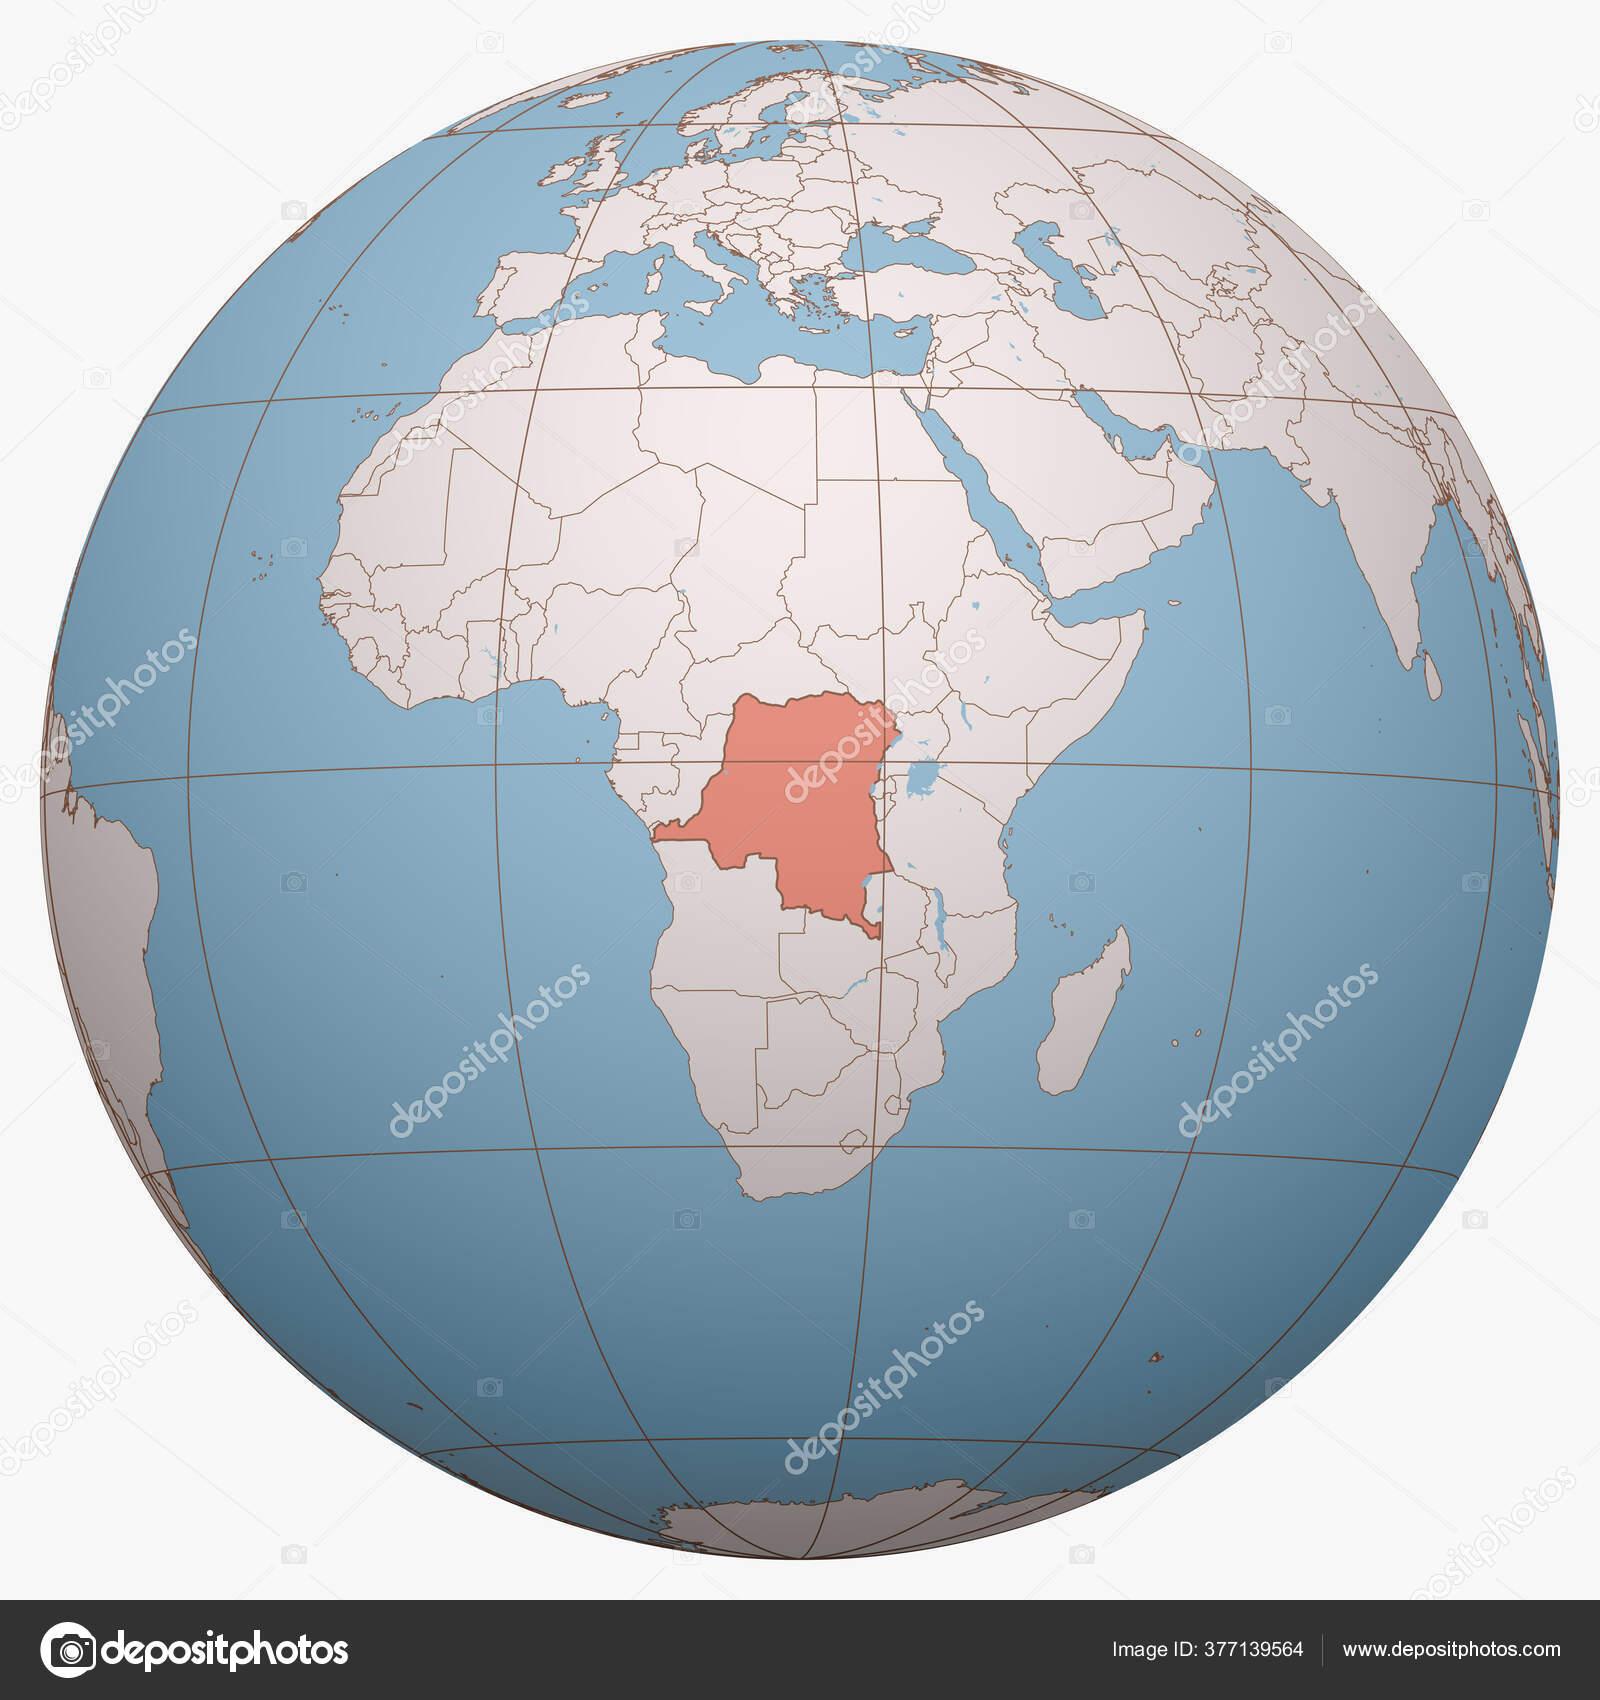 Picture of: Congo Globe Earth Hemisphere Centered Location Democratic Republic Congo Drc Stock Vector C Antonshahrai 377139564